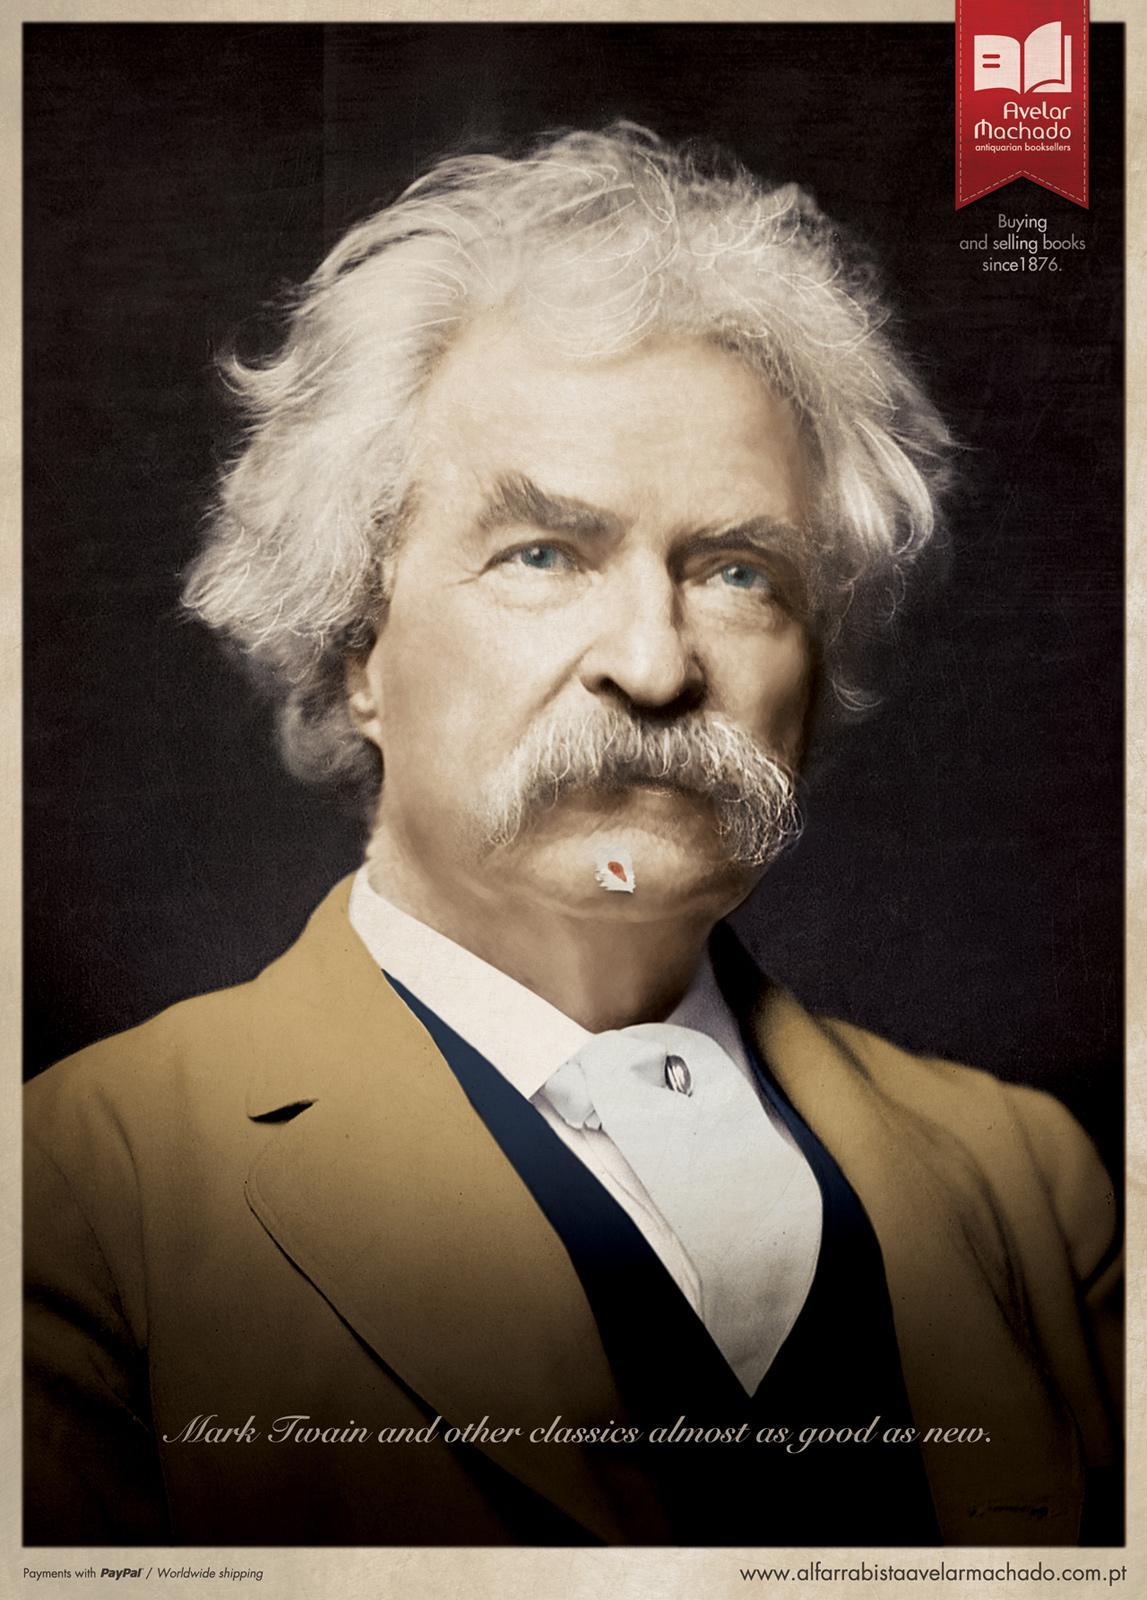 Avelar Machado Print Ad -  Mark Twain